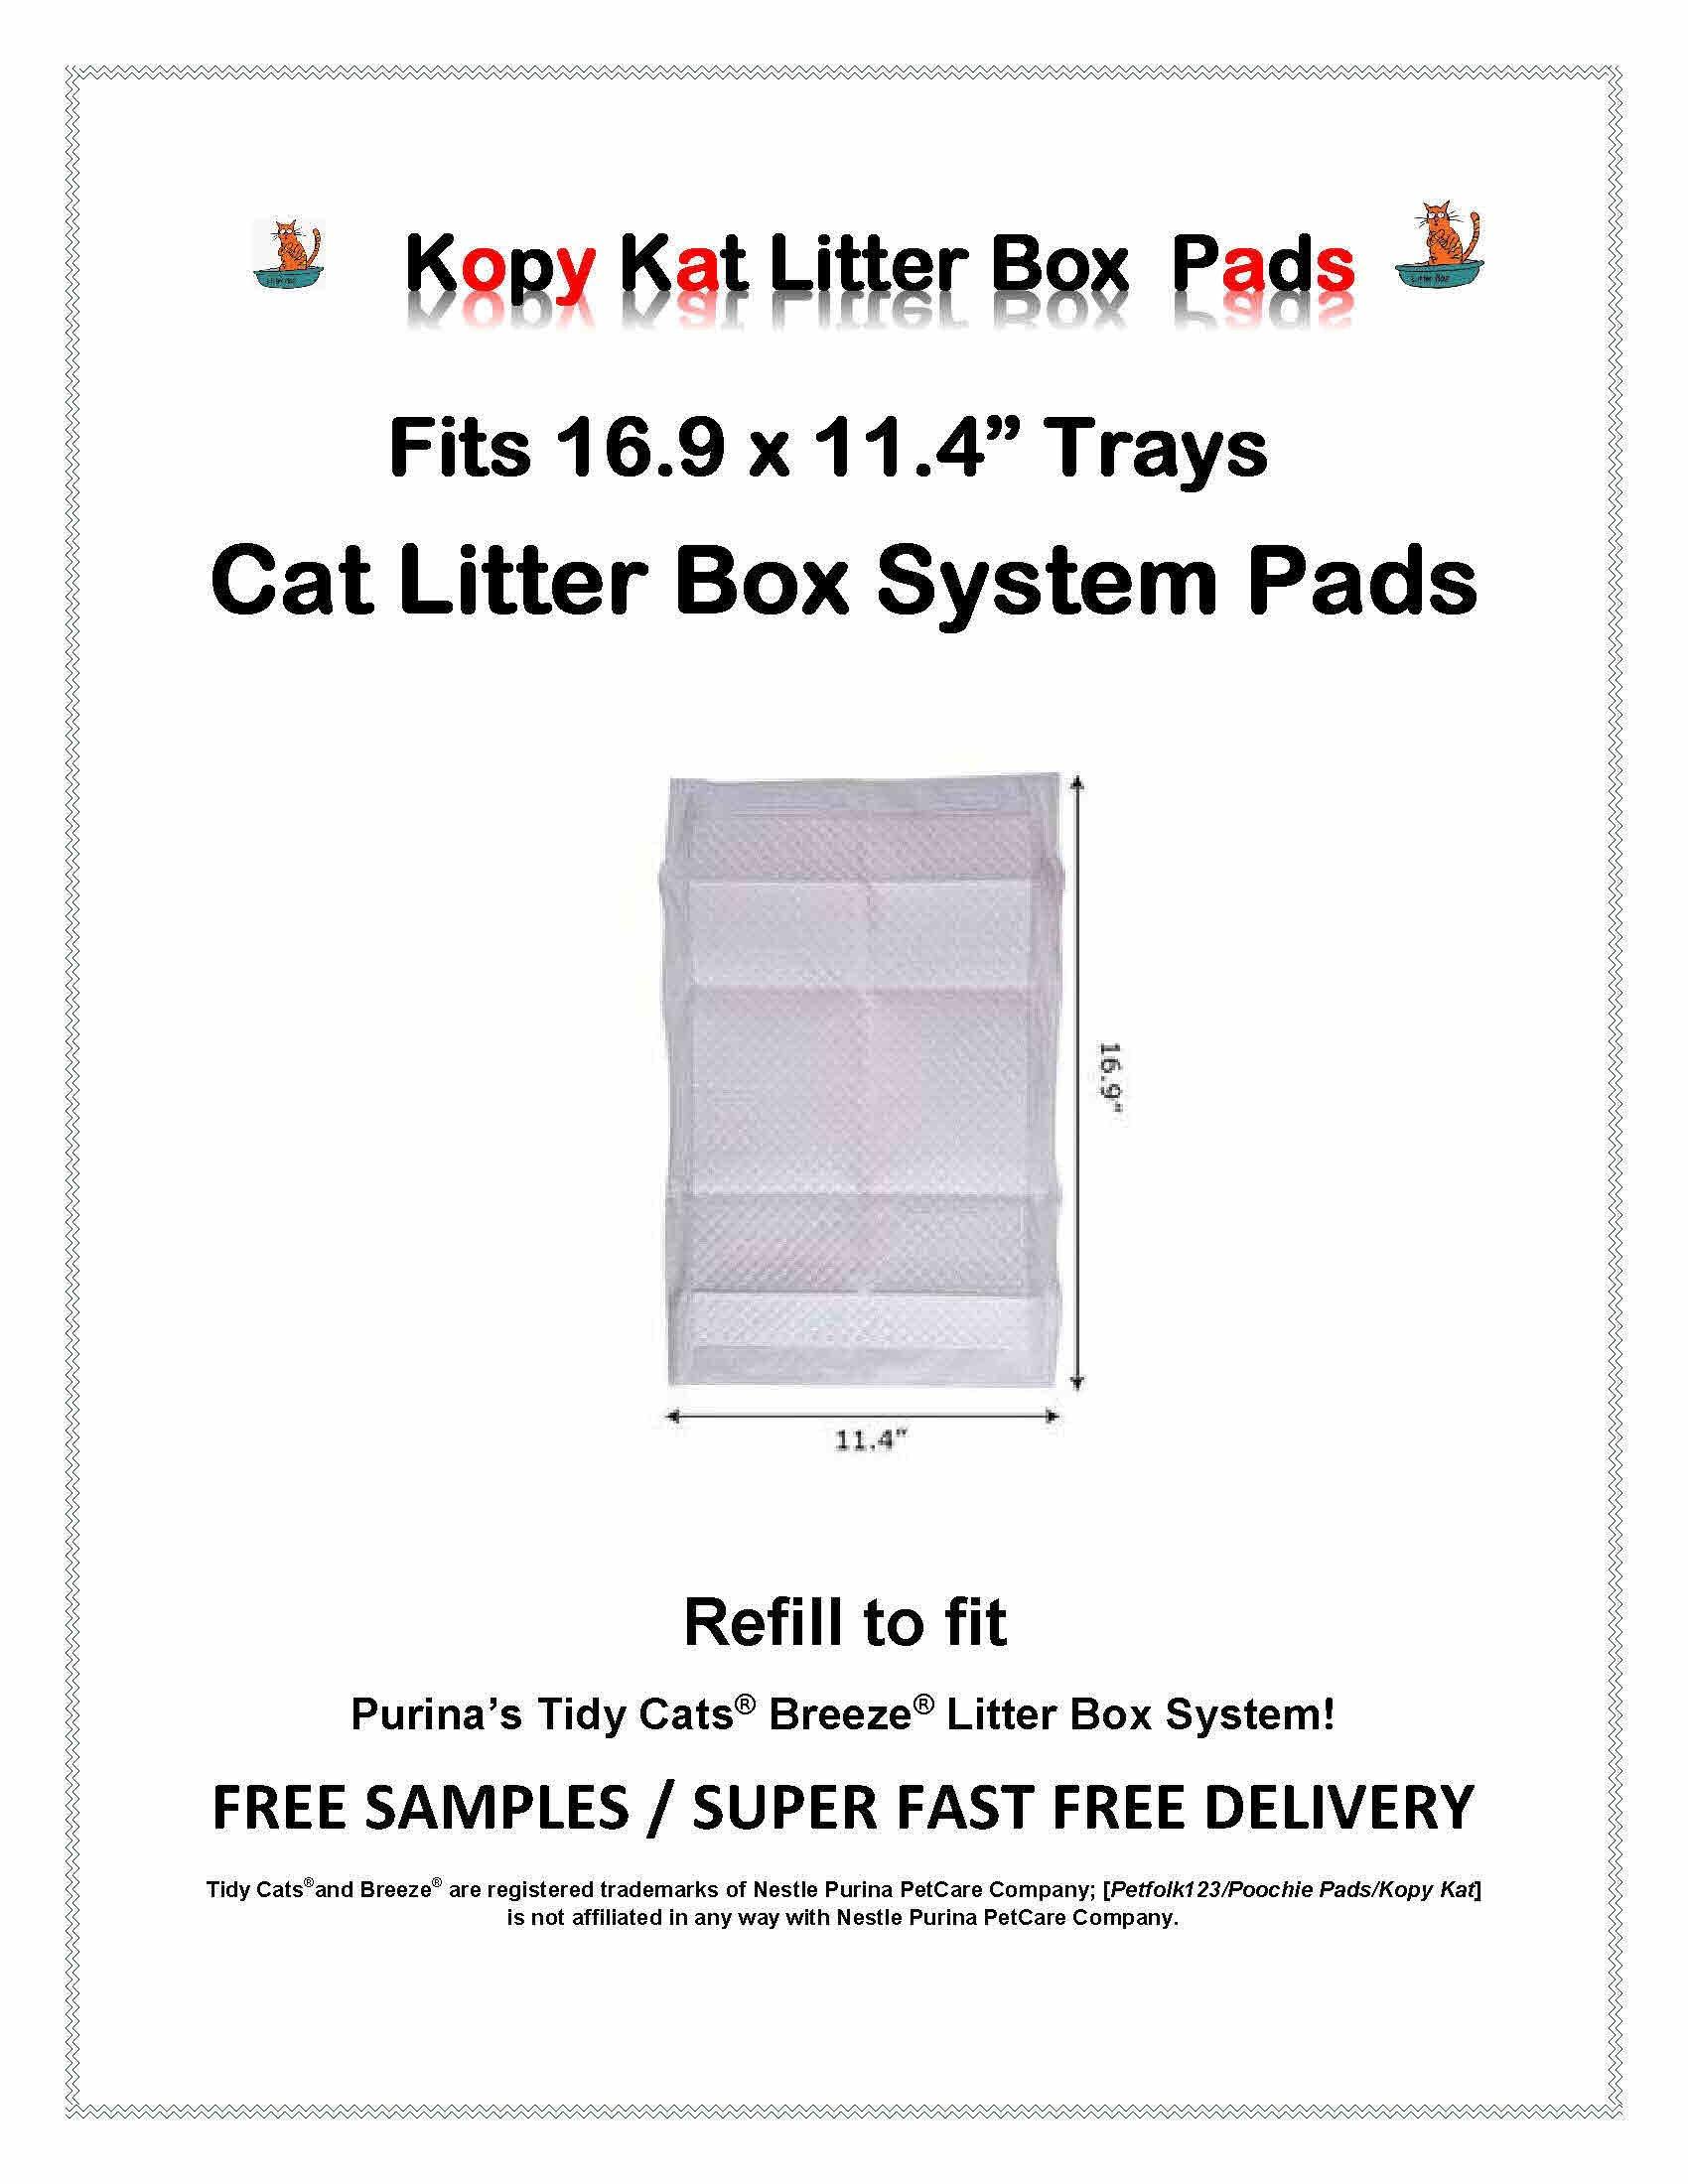 Kopy Kat 16.9 x 11.4 Cat Litter Box Pads Refill Pads-Same Quality Less Expensive 120 pads